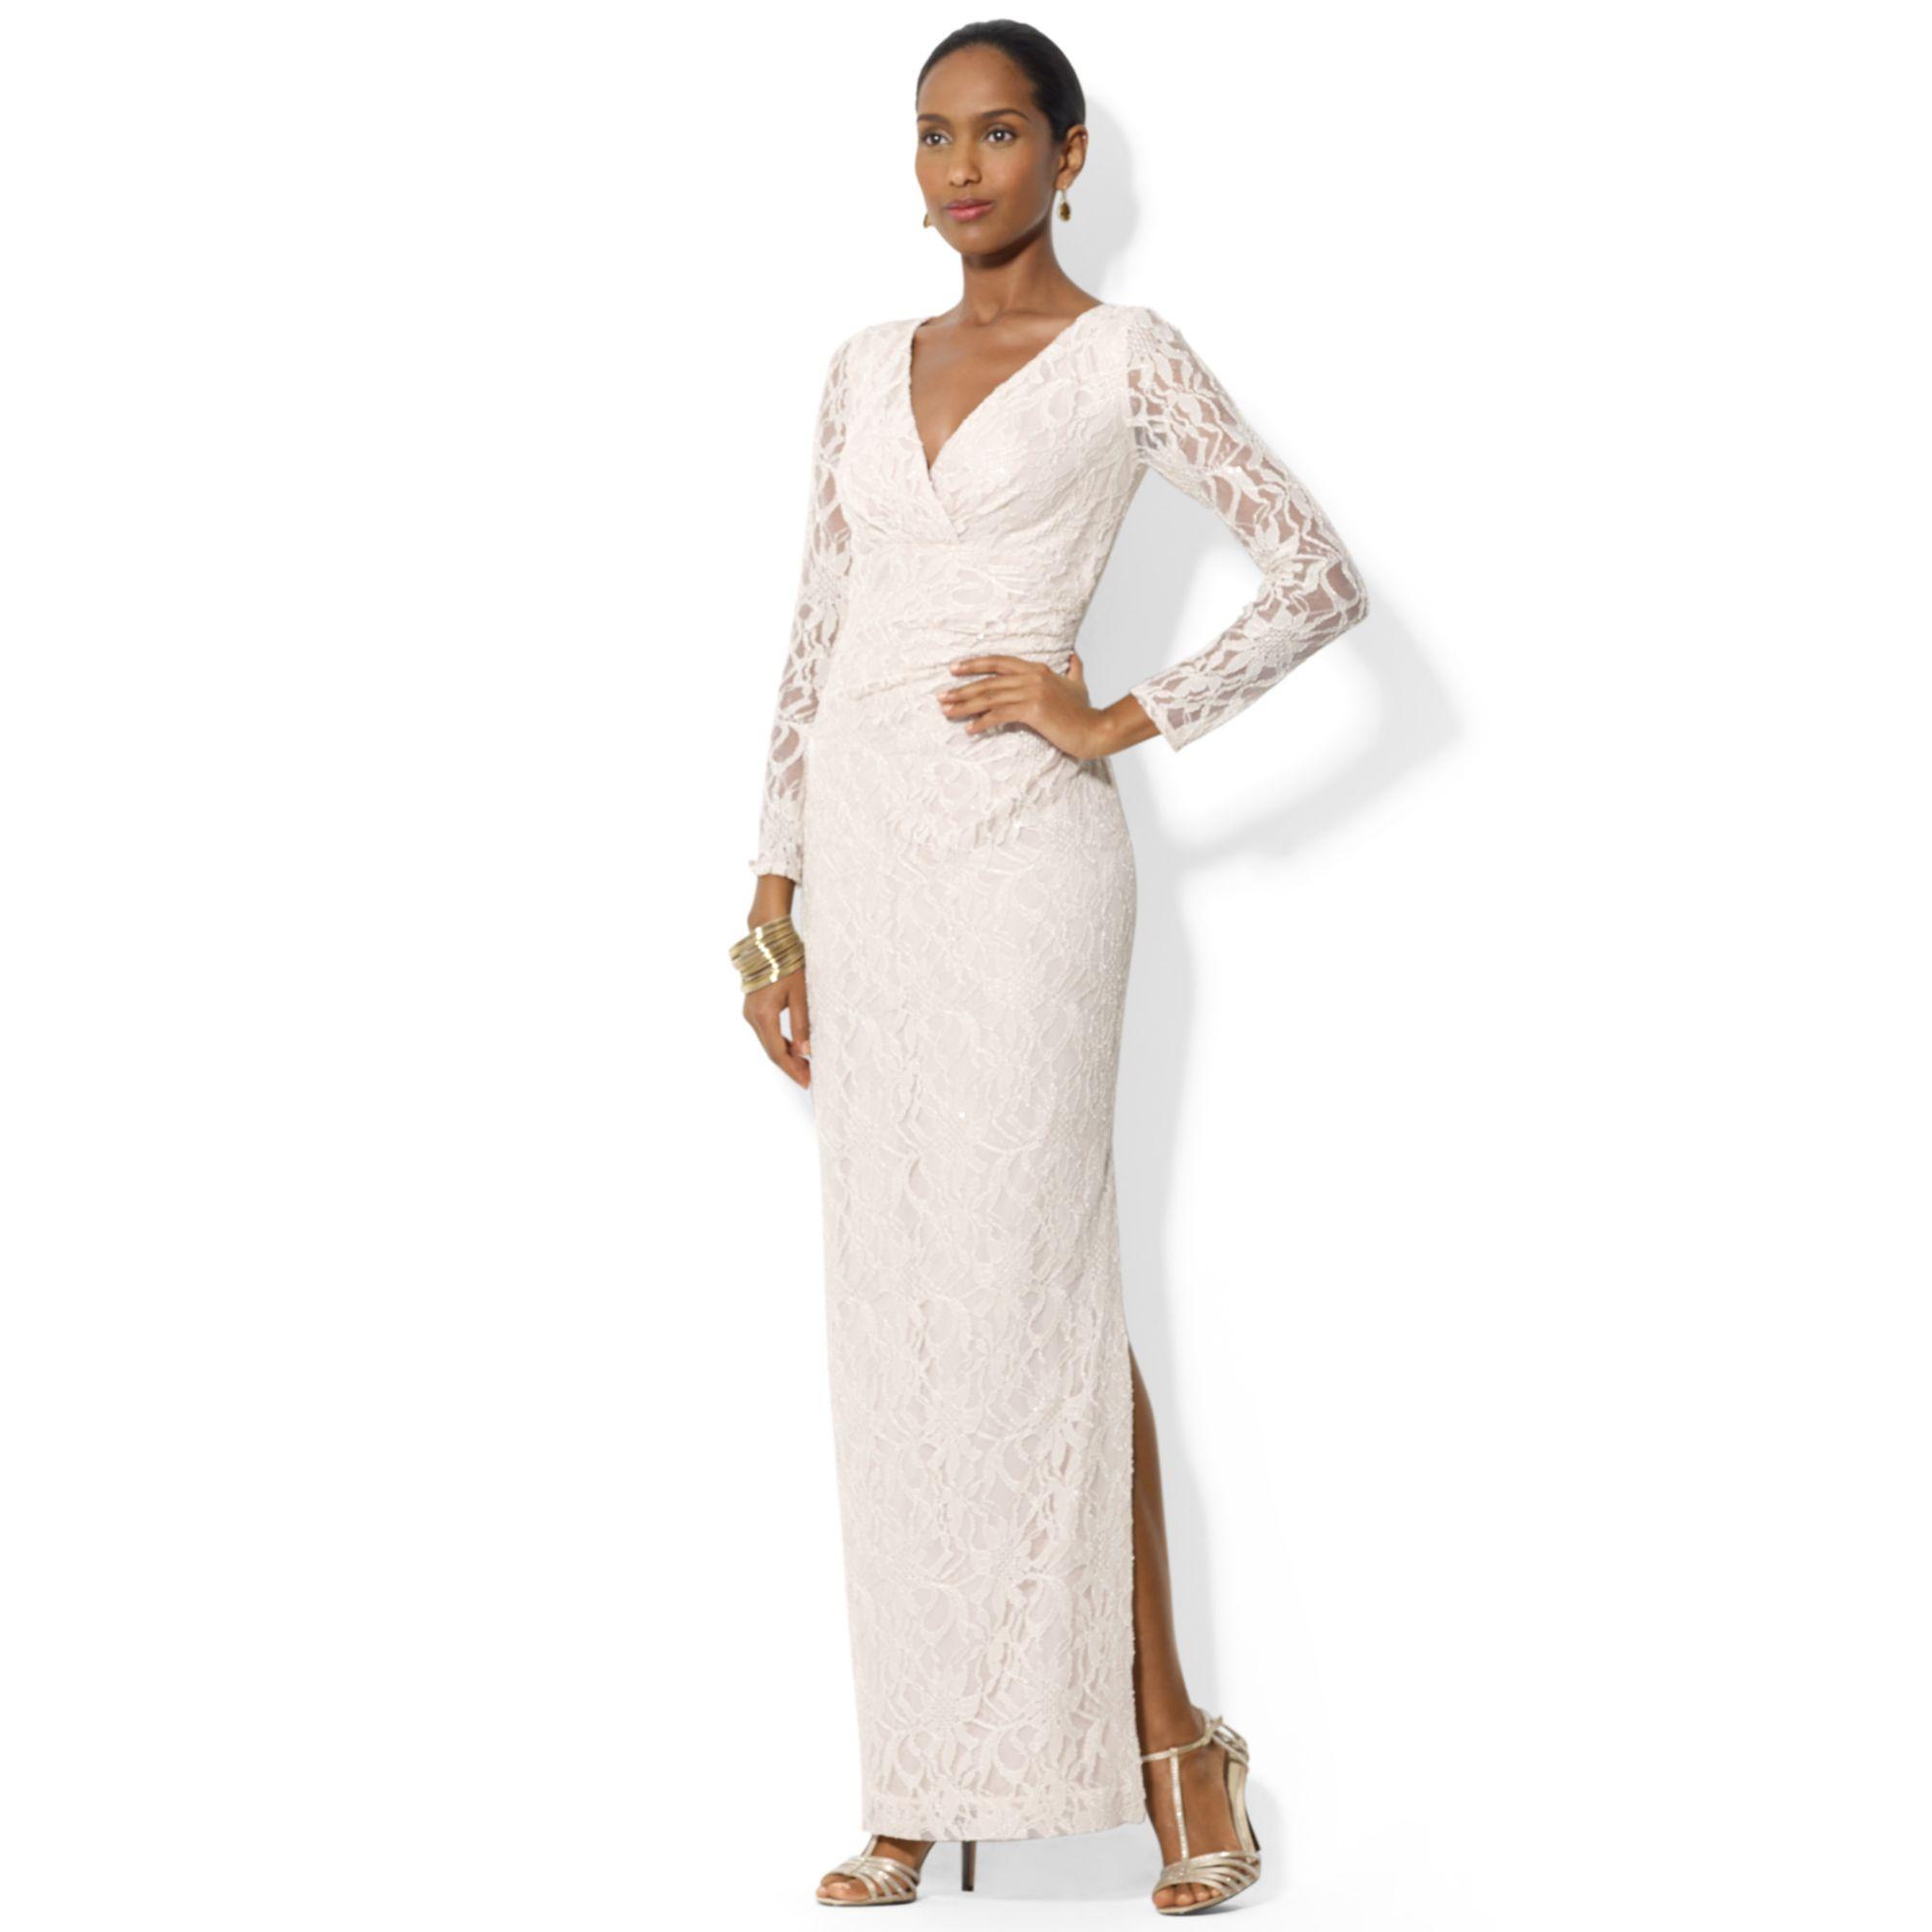 42f8c617863f6 Long Party Dresses Macys - raveitsafe